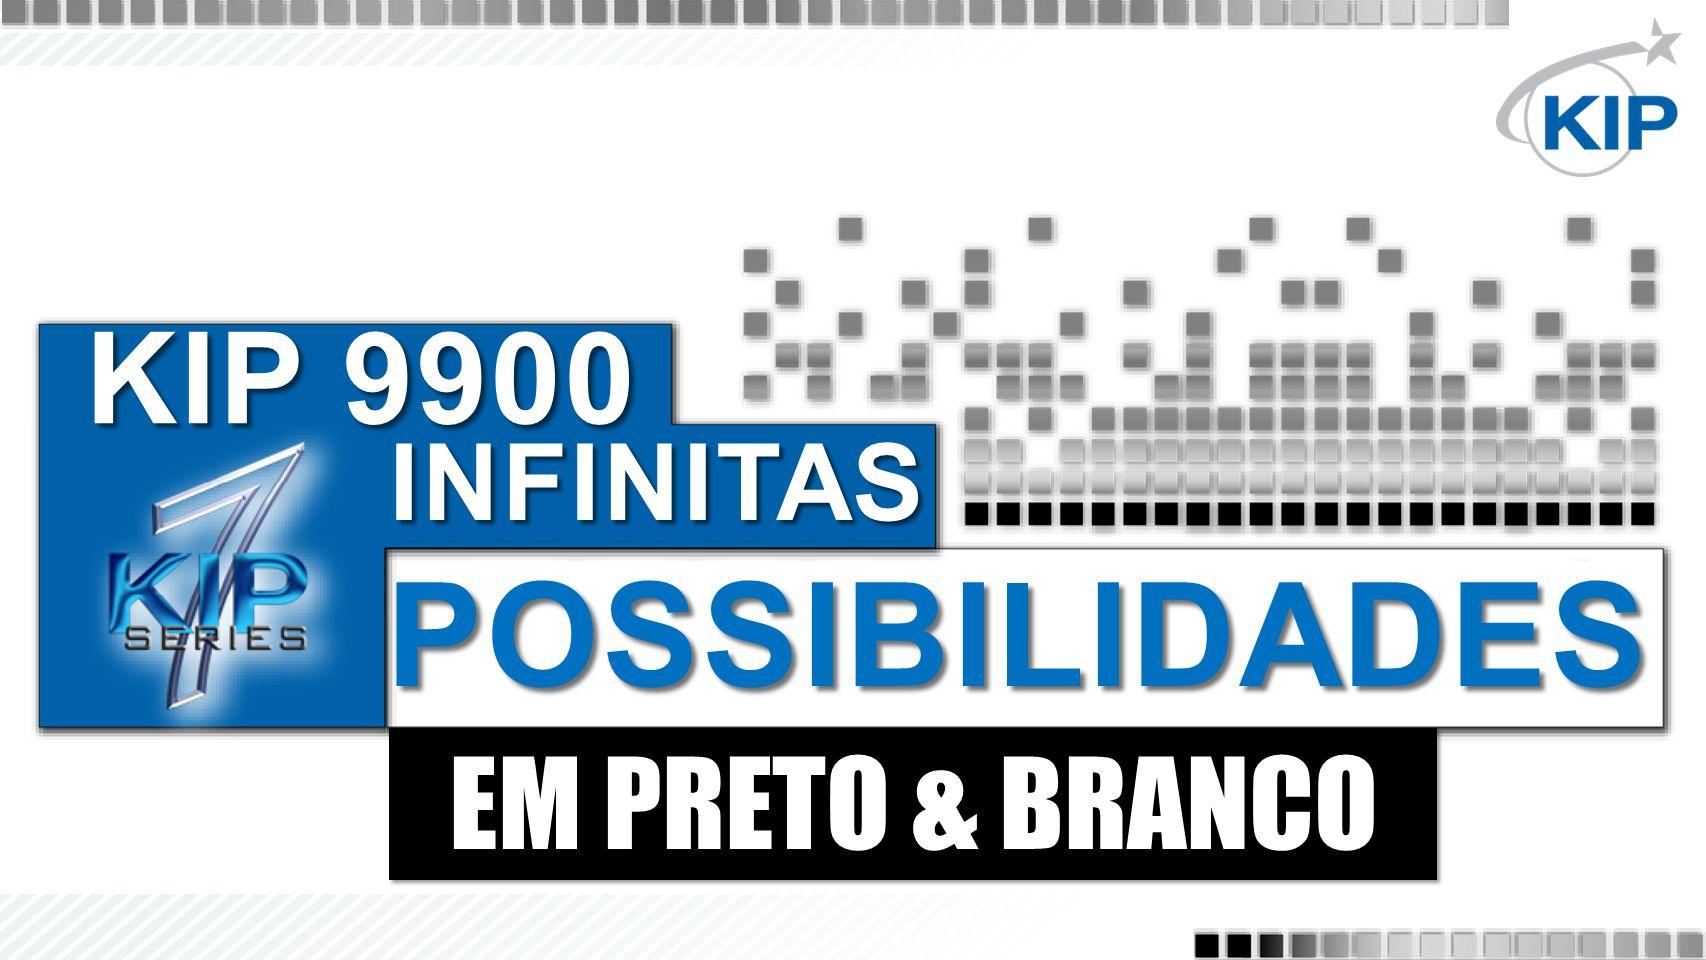 EM PRETO & BRANCO KIP 9900 INFINITAS POSSIBILIDADES